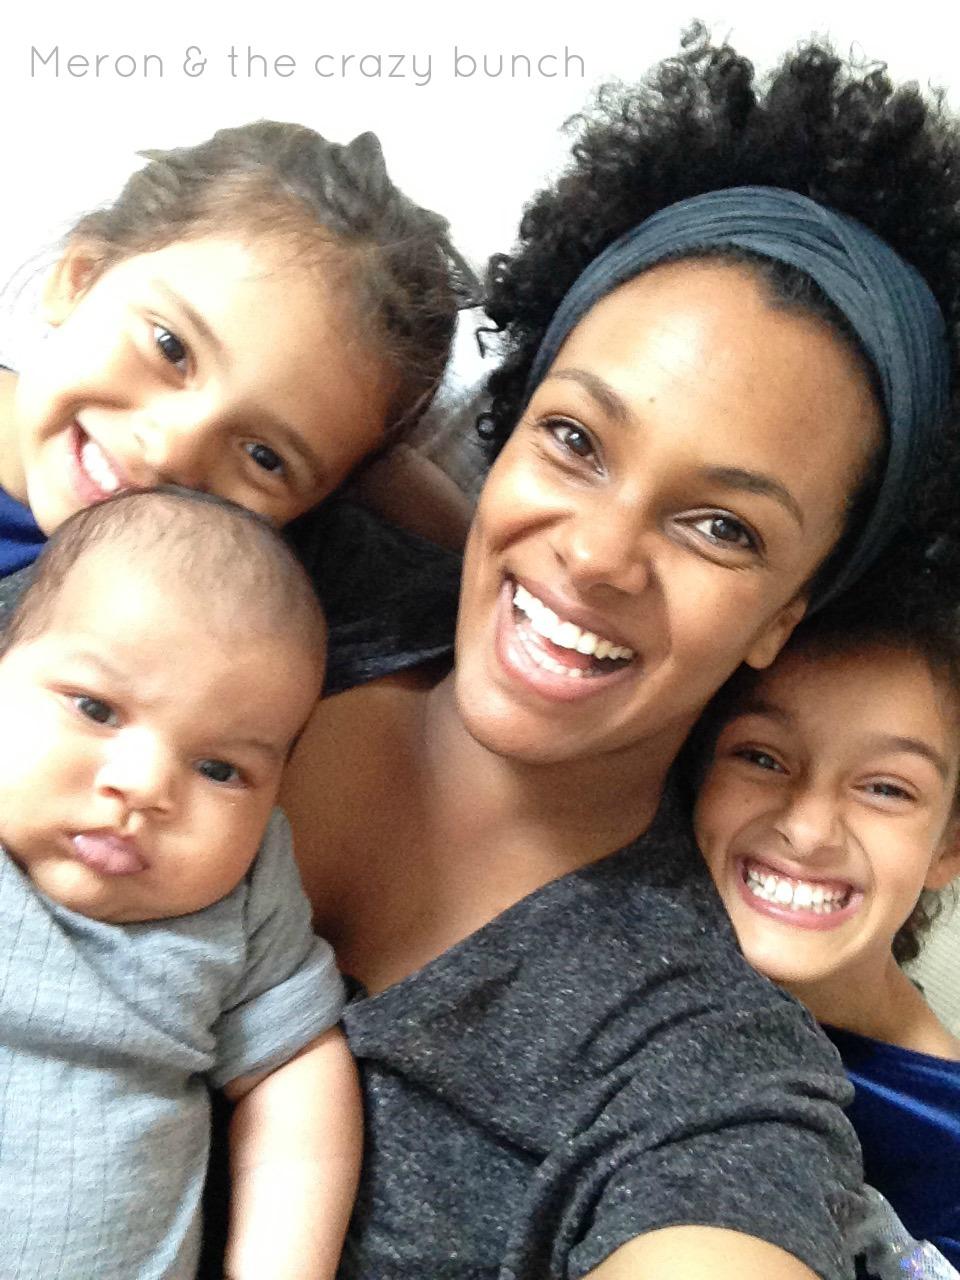 Die gute Mutter, Mütter Interview, Meron, Familie, Mütter, Solidarität